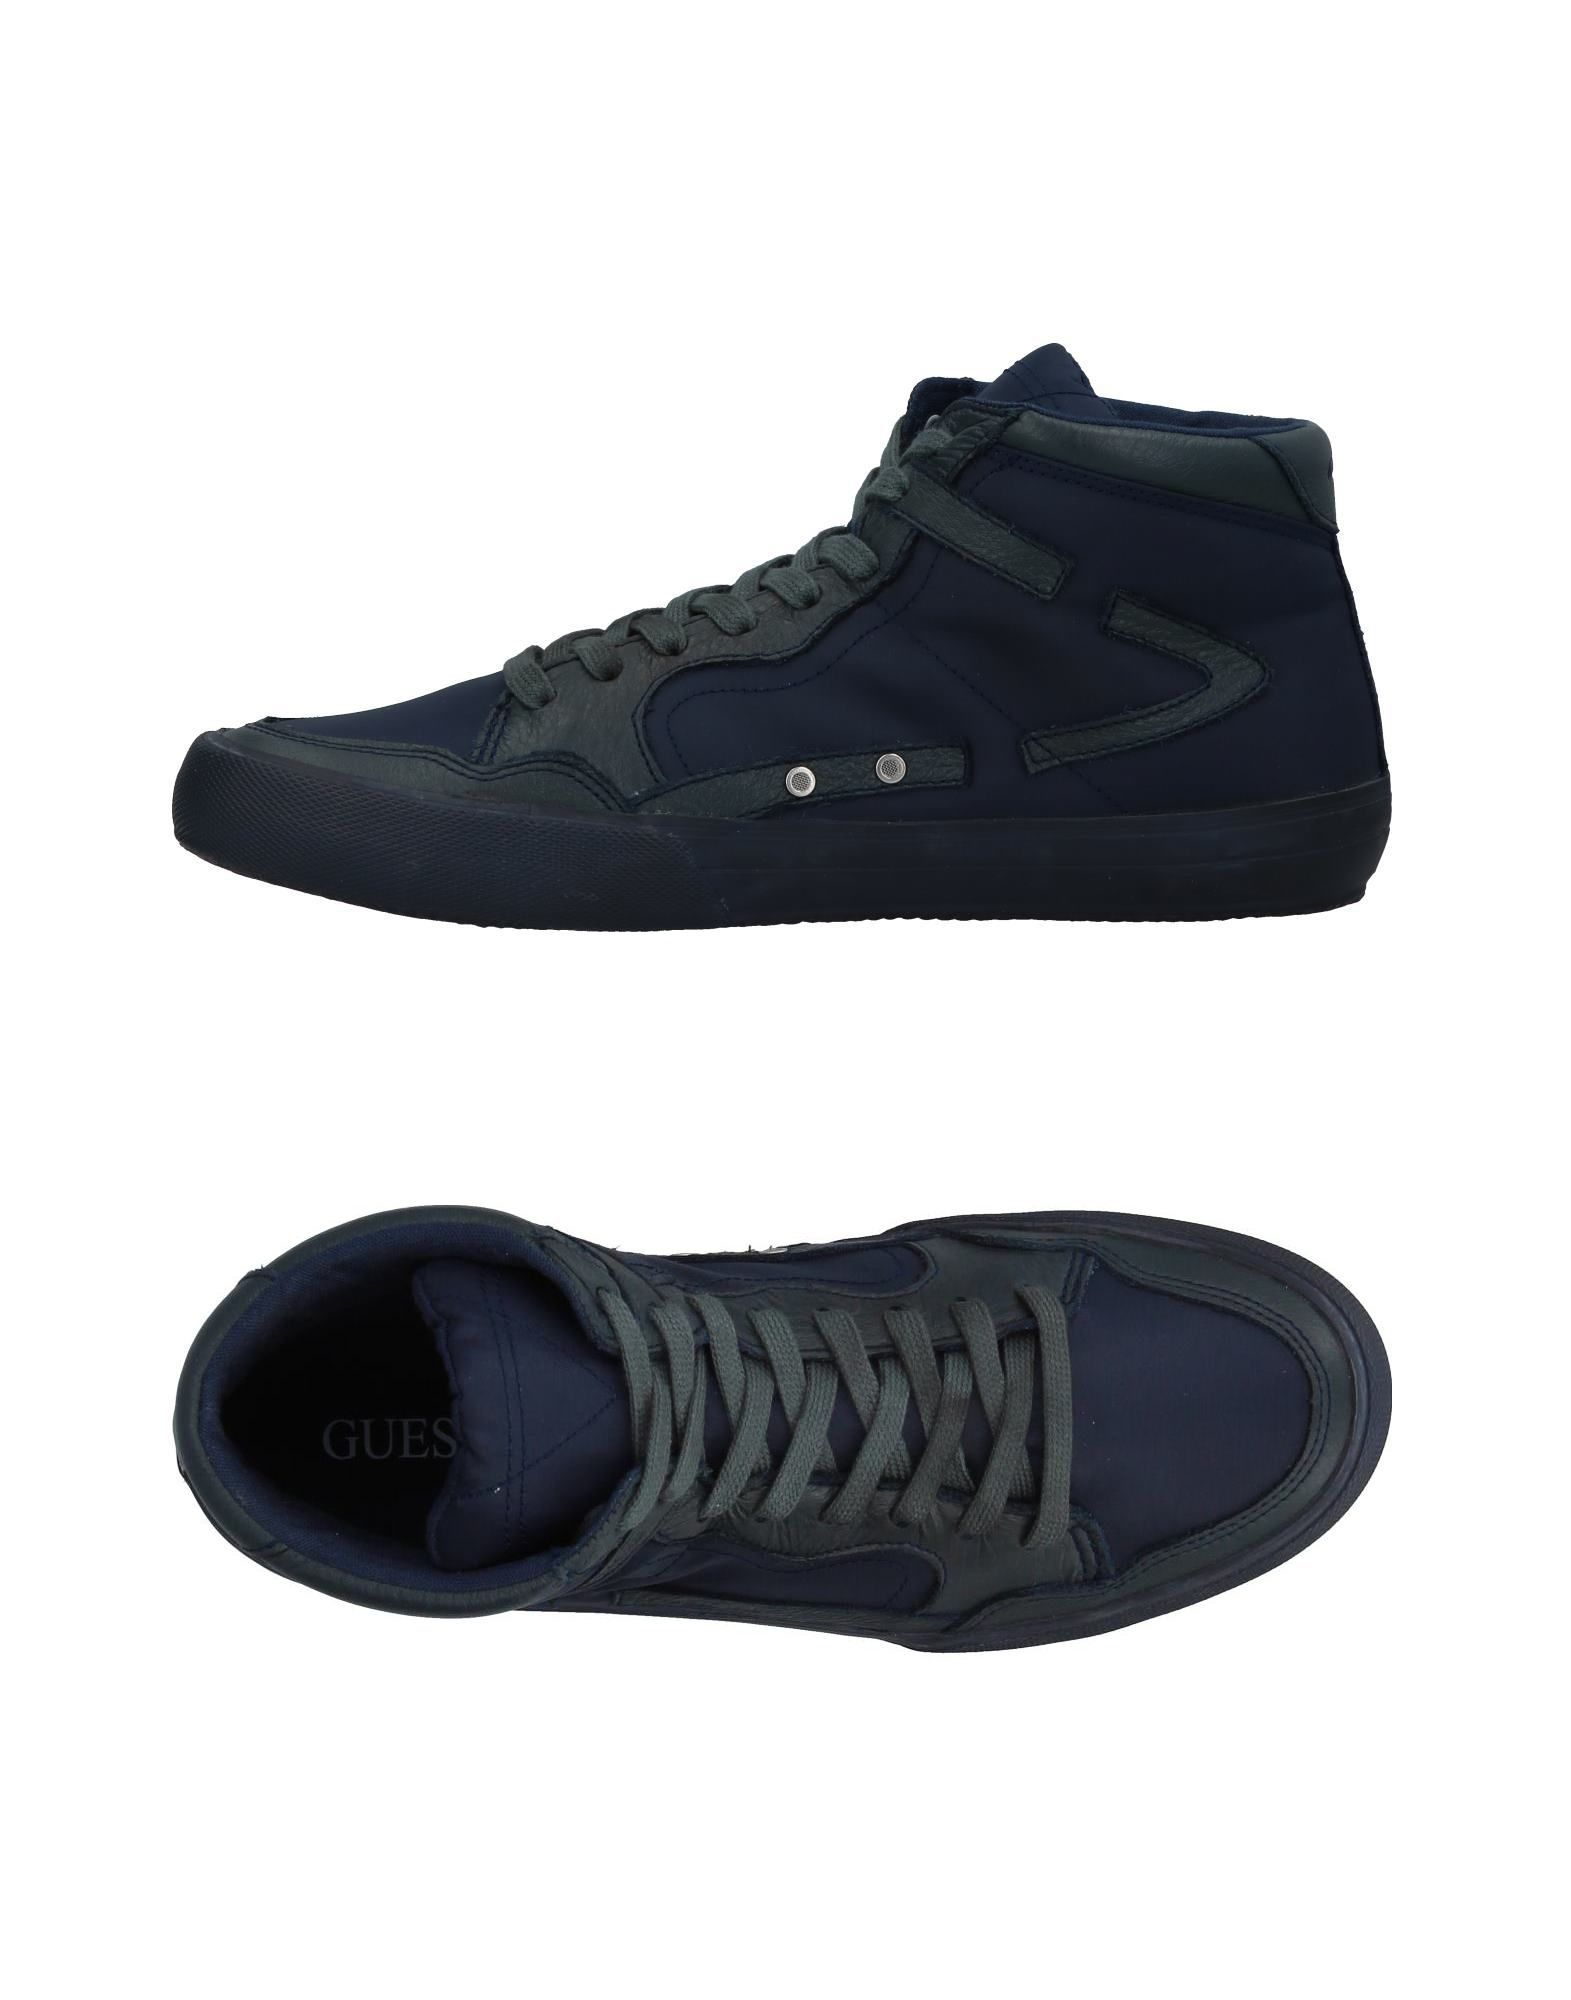 Sneakers Guess Homme - Sneakers Guess  Bleu foncé Super rabais